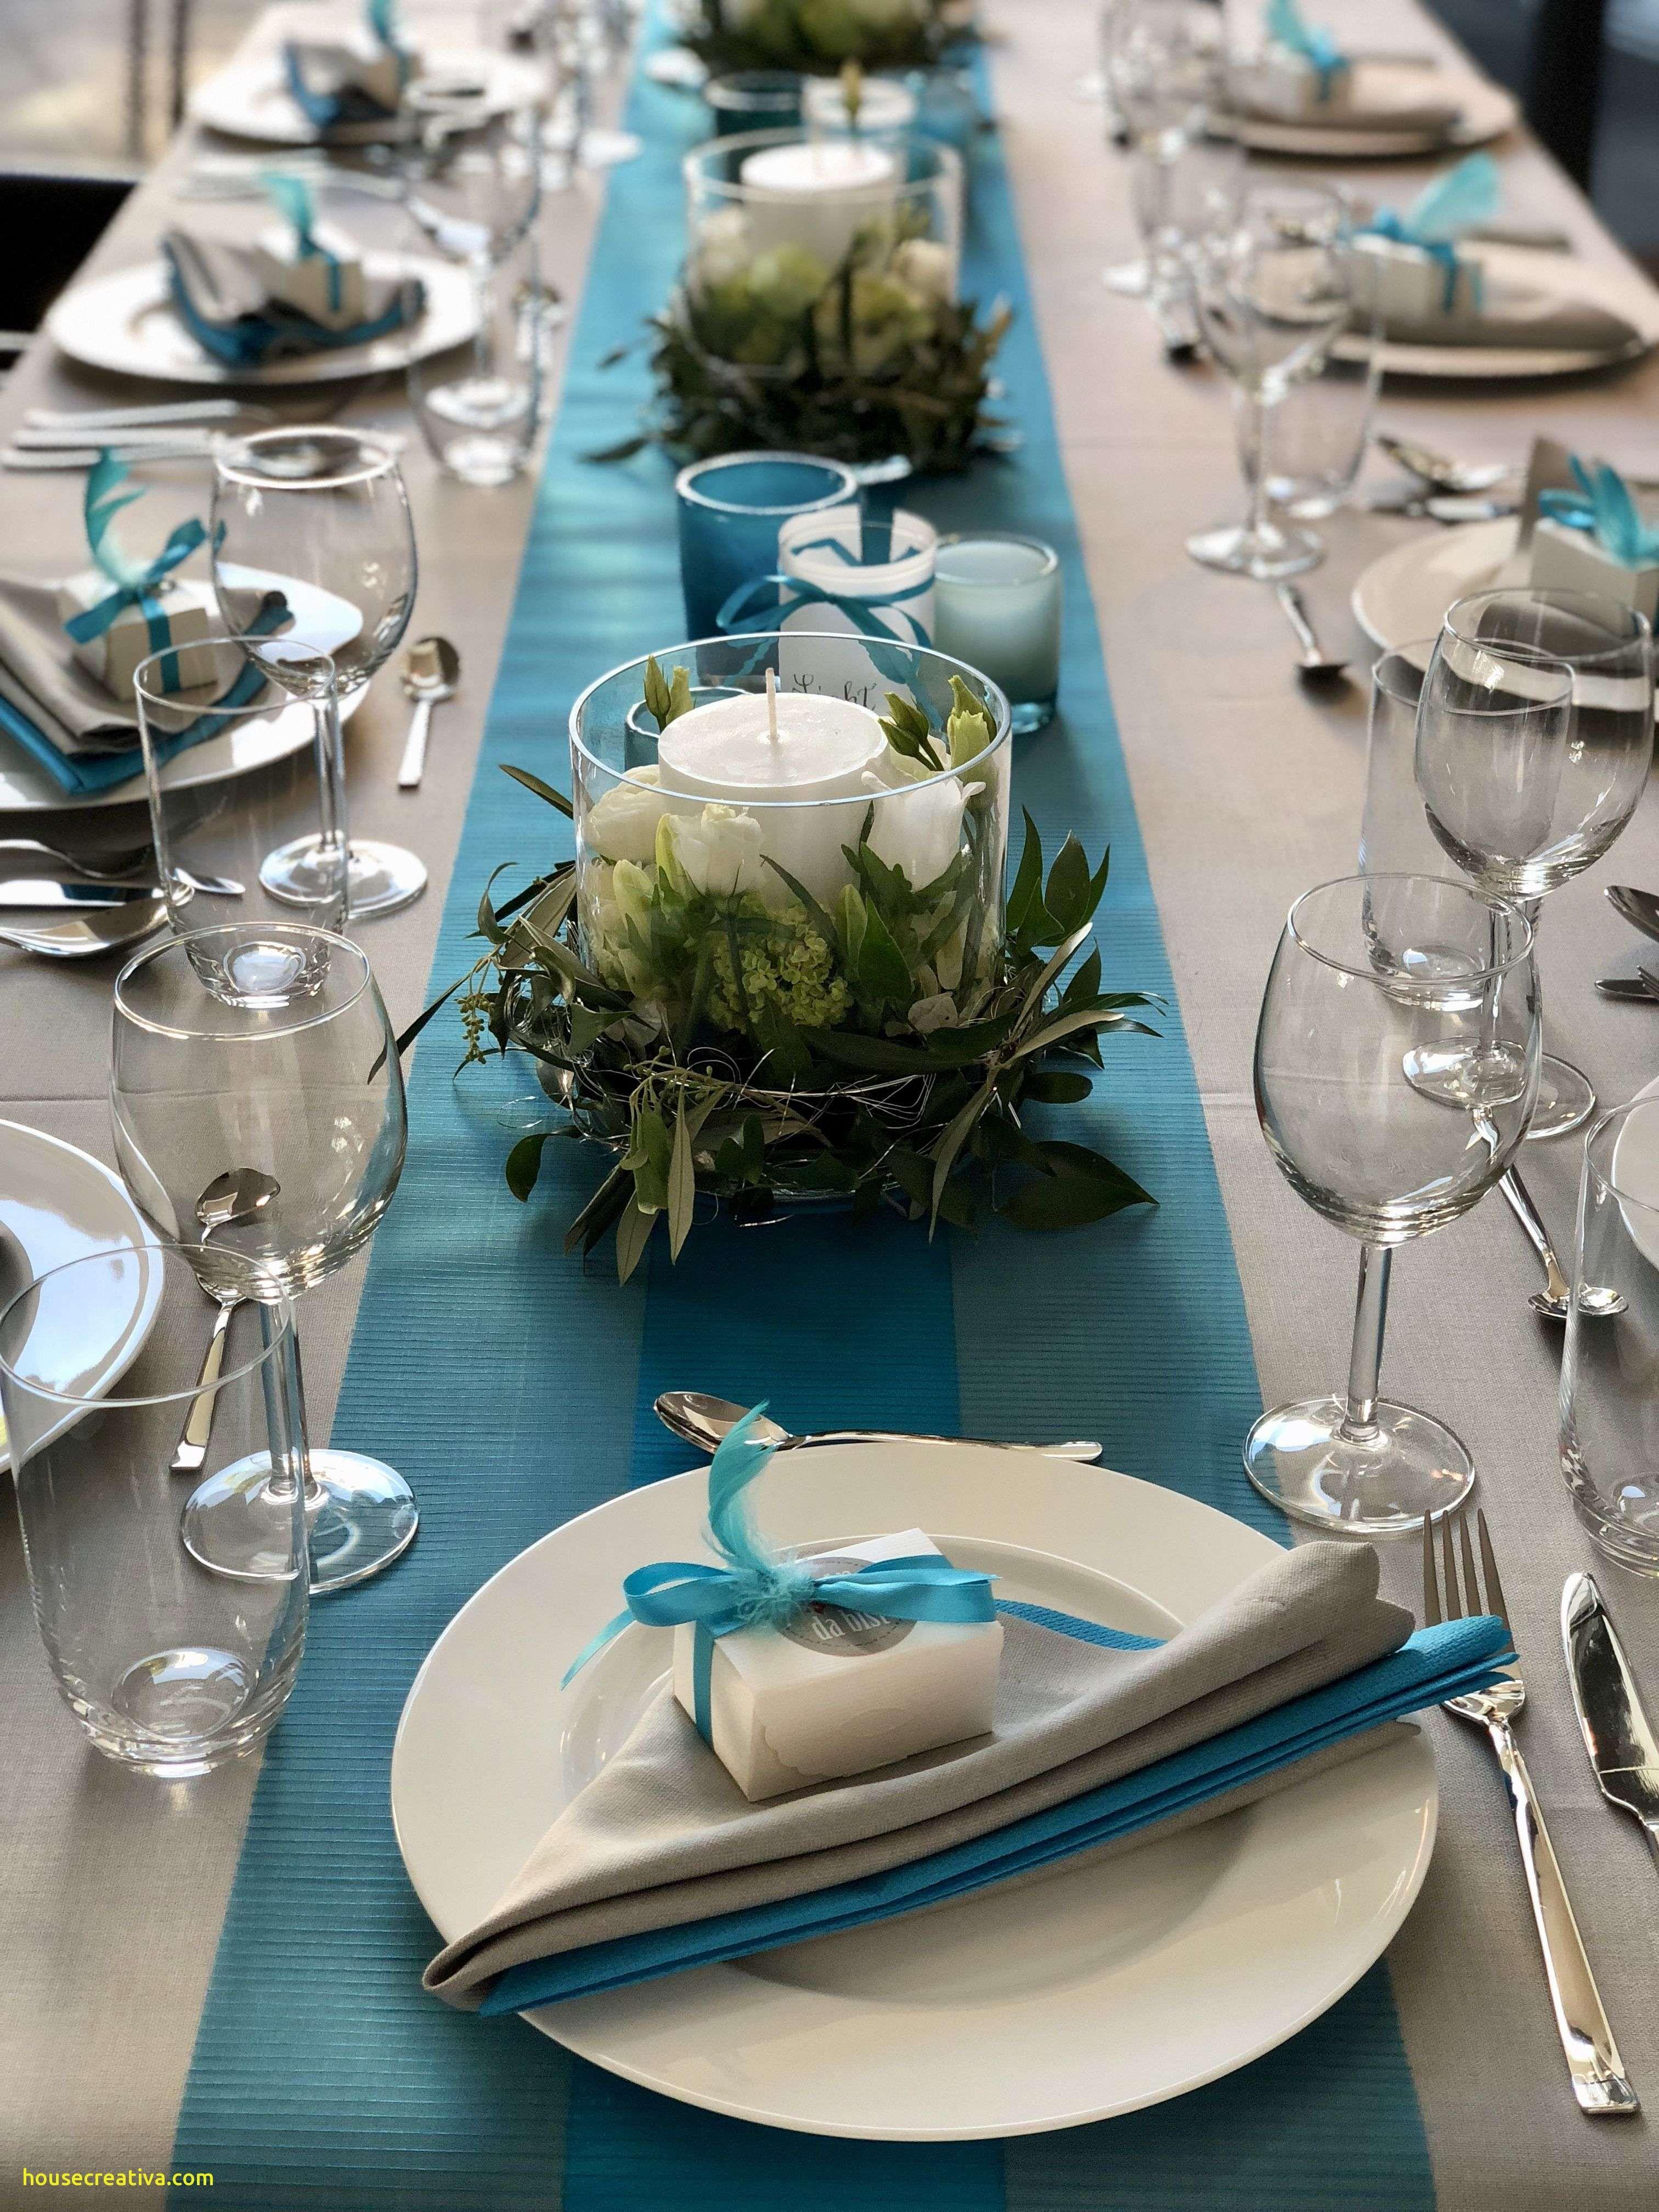 Elegant Blue White Silver Table Decorations Homedecoration Homedecorations Homedecorationideas Home Table Decorations Dinner Table Setting Table Settings